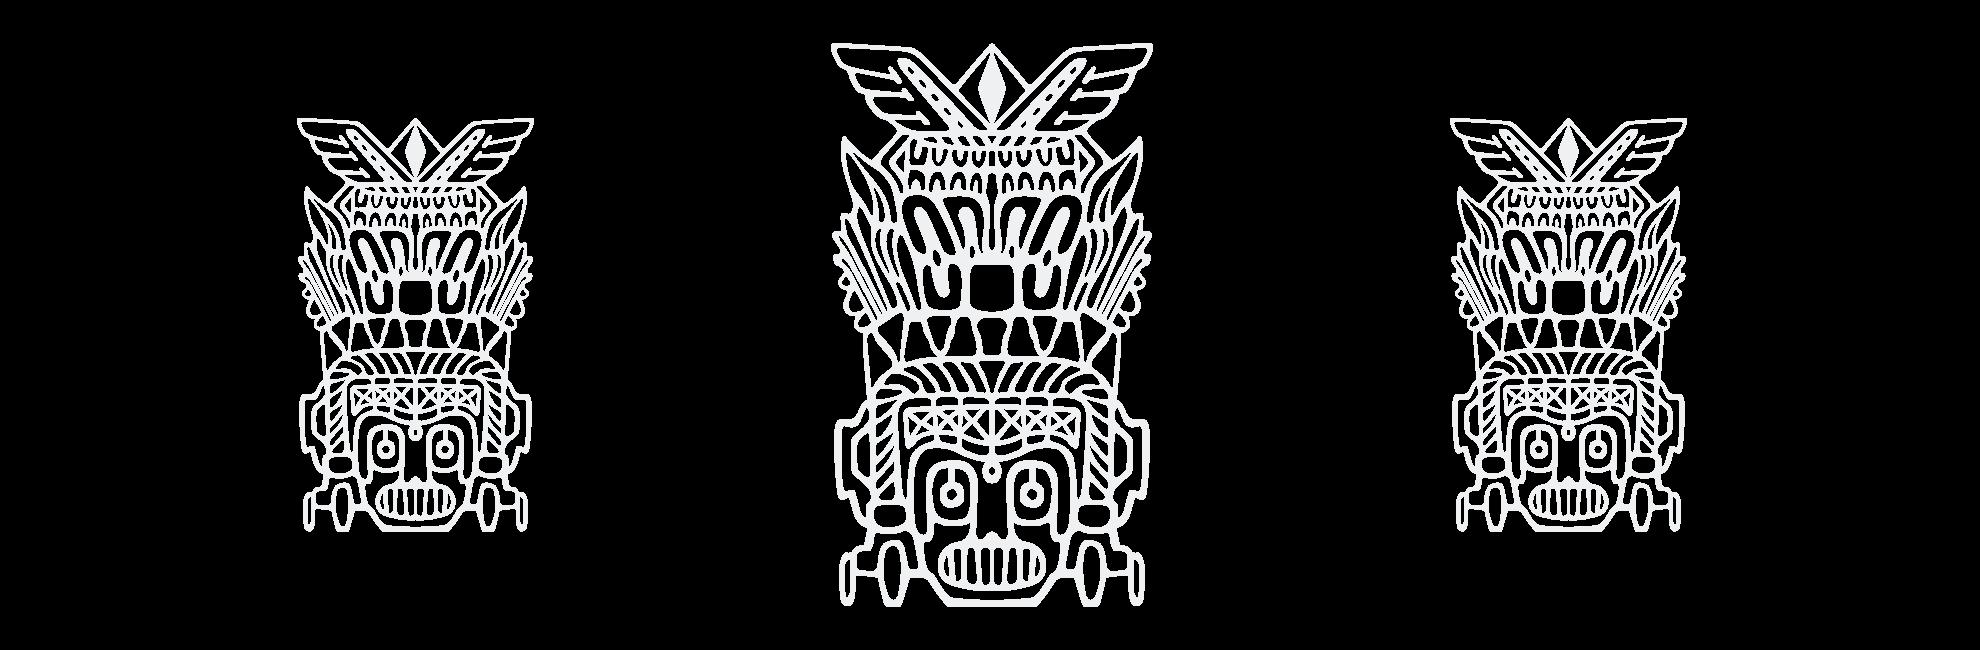 logo_tete_black (1).png